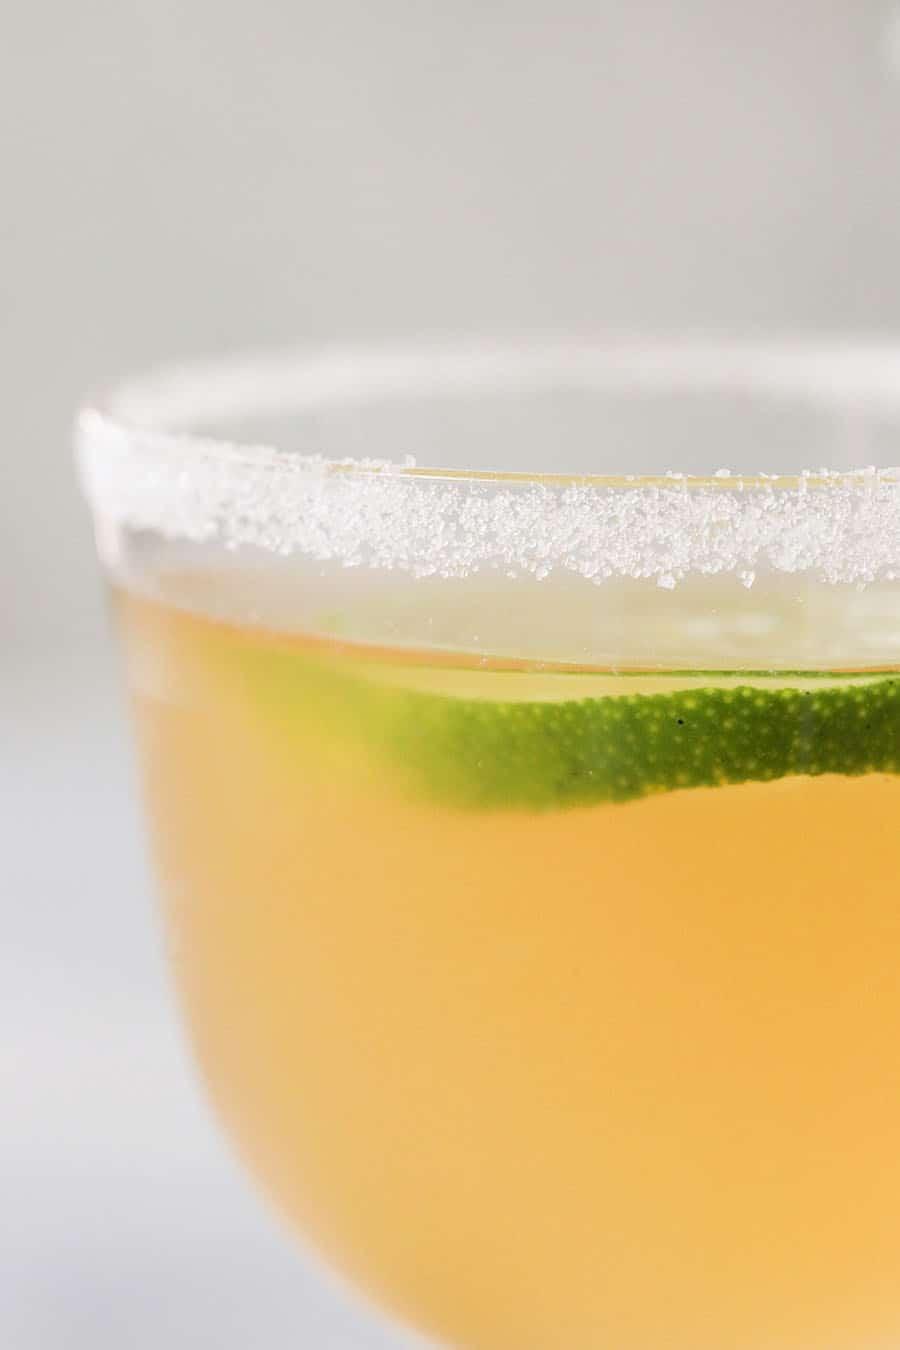 Close up photo of a three Ingredient Classic Daiquiri